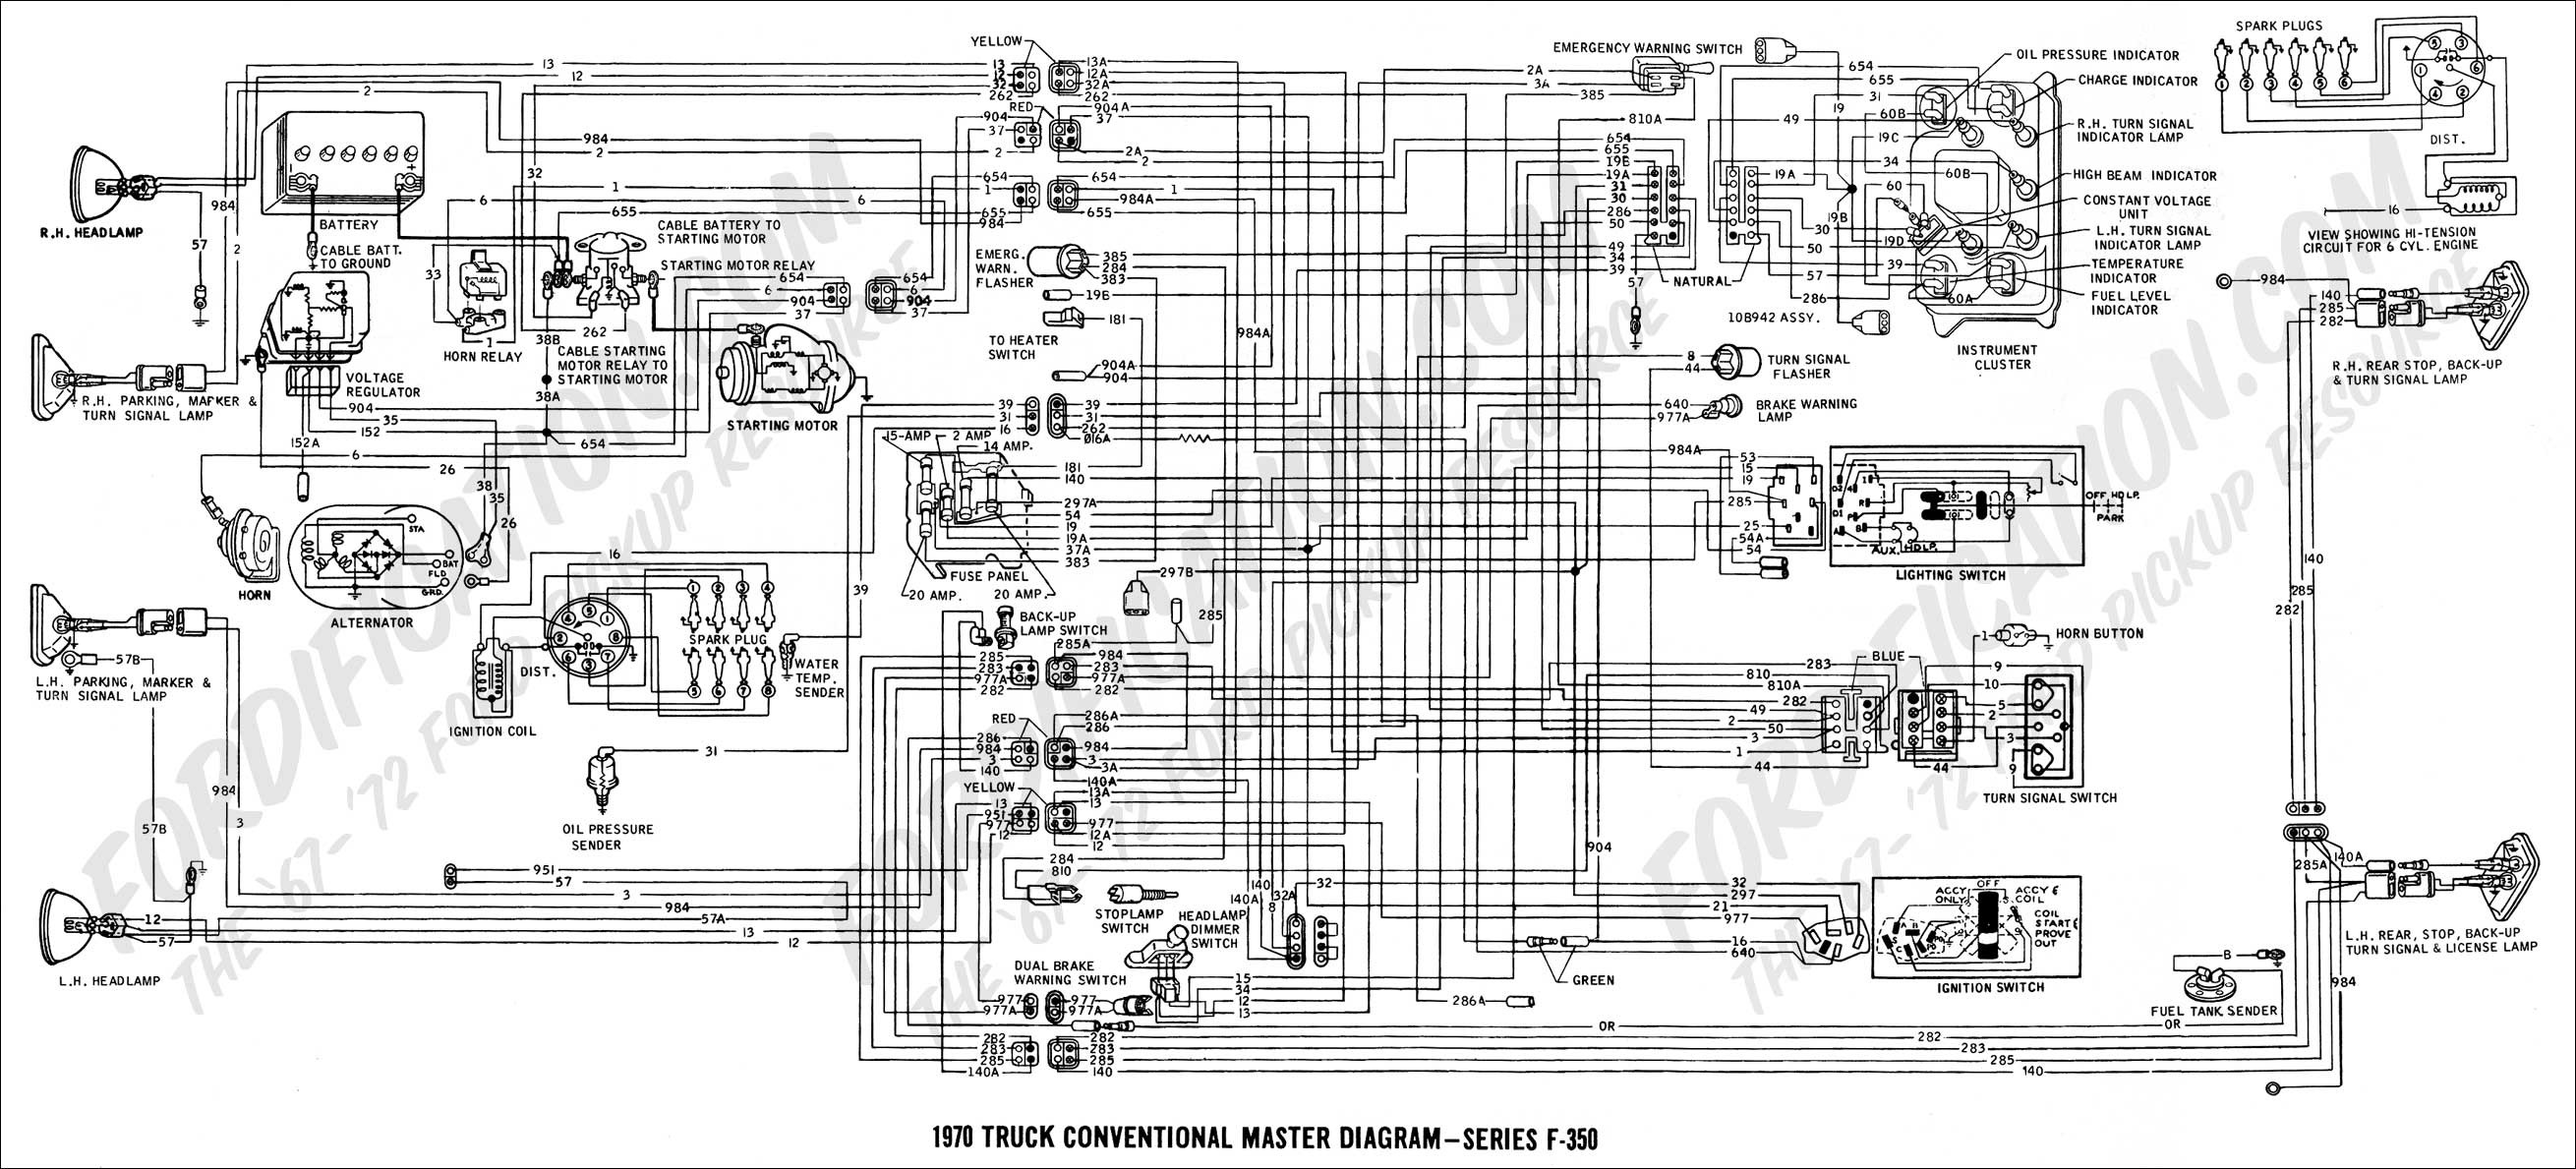 Mitsubishi Galant Engine Diagram 1974broncowiringdiagram Wiring Diagram ford F100 Alternator Wiring Of Mitsubishi Galant Engine Diagram